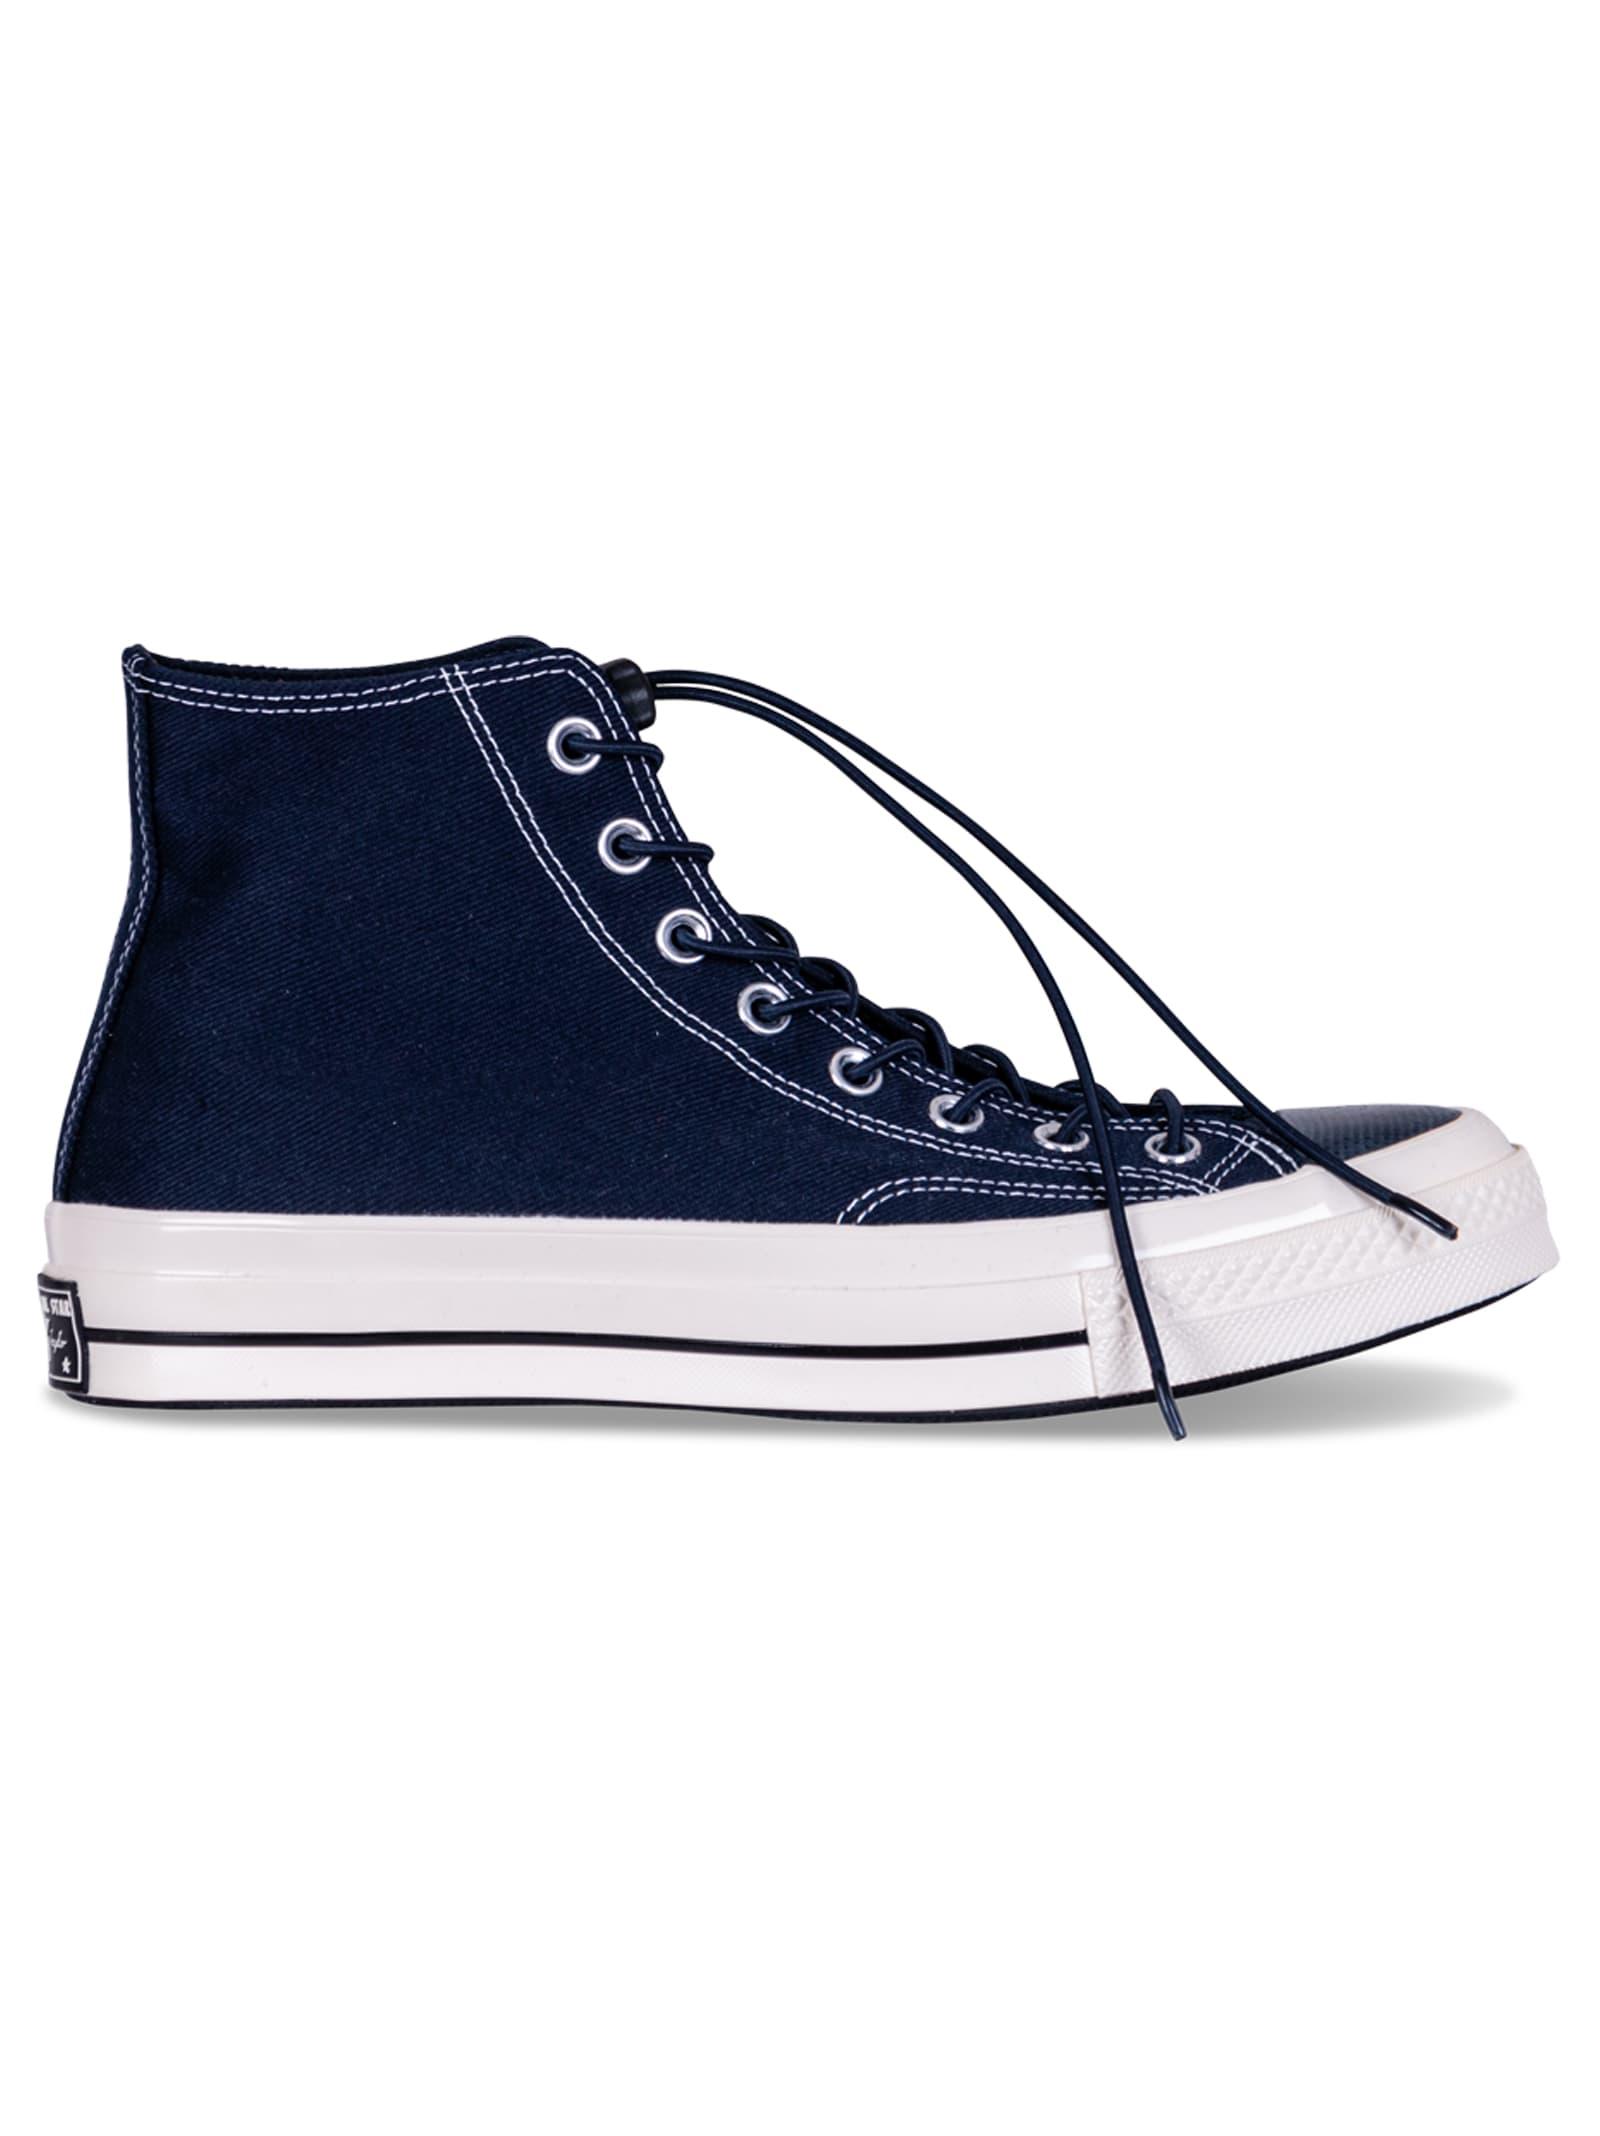 converse chuck taylor all star blu